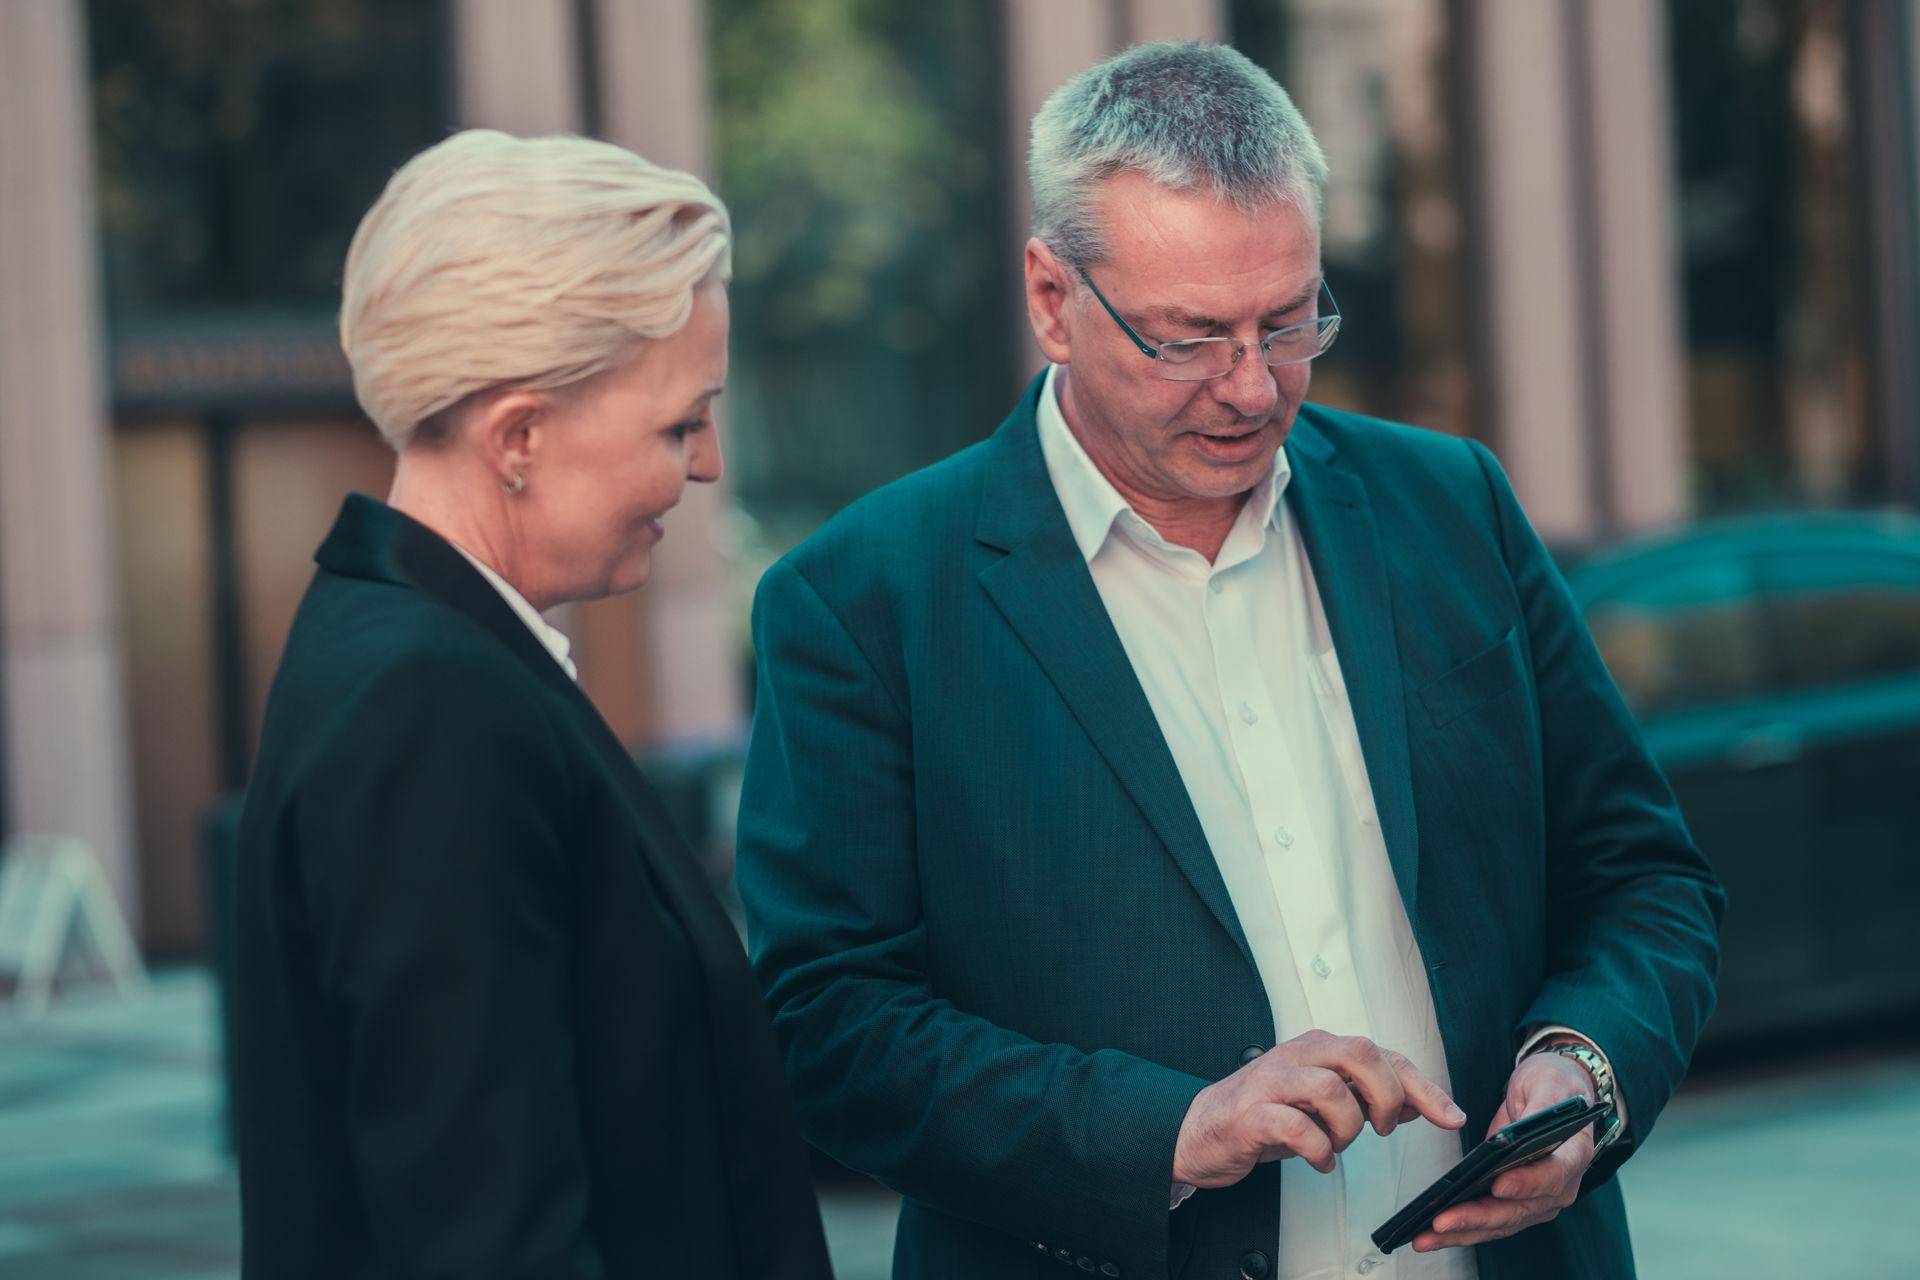 FotoWare employees using the FotoWare Mobile App